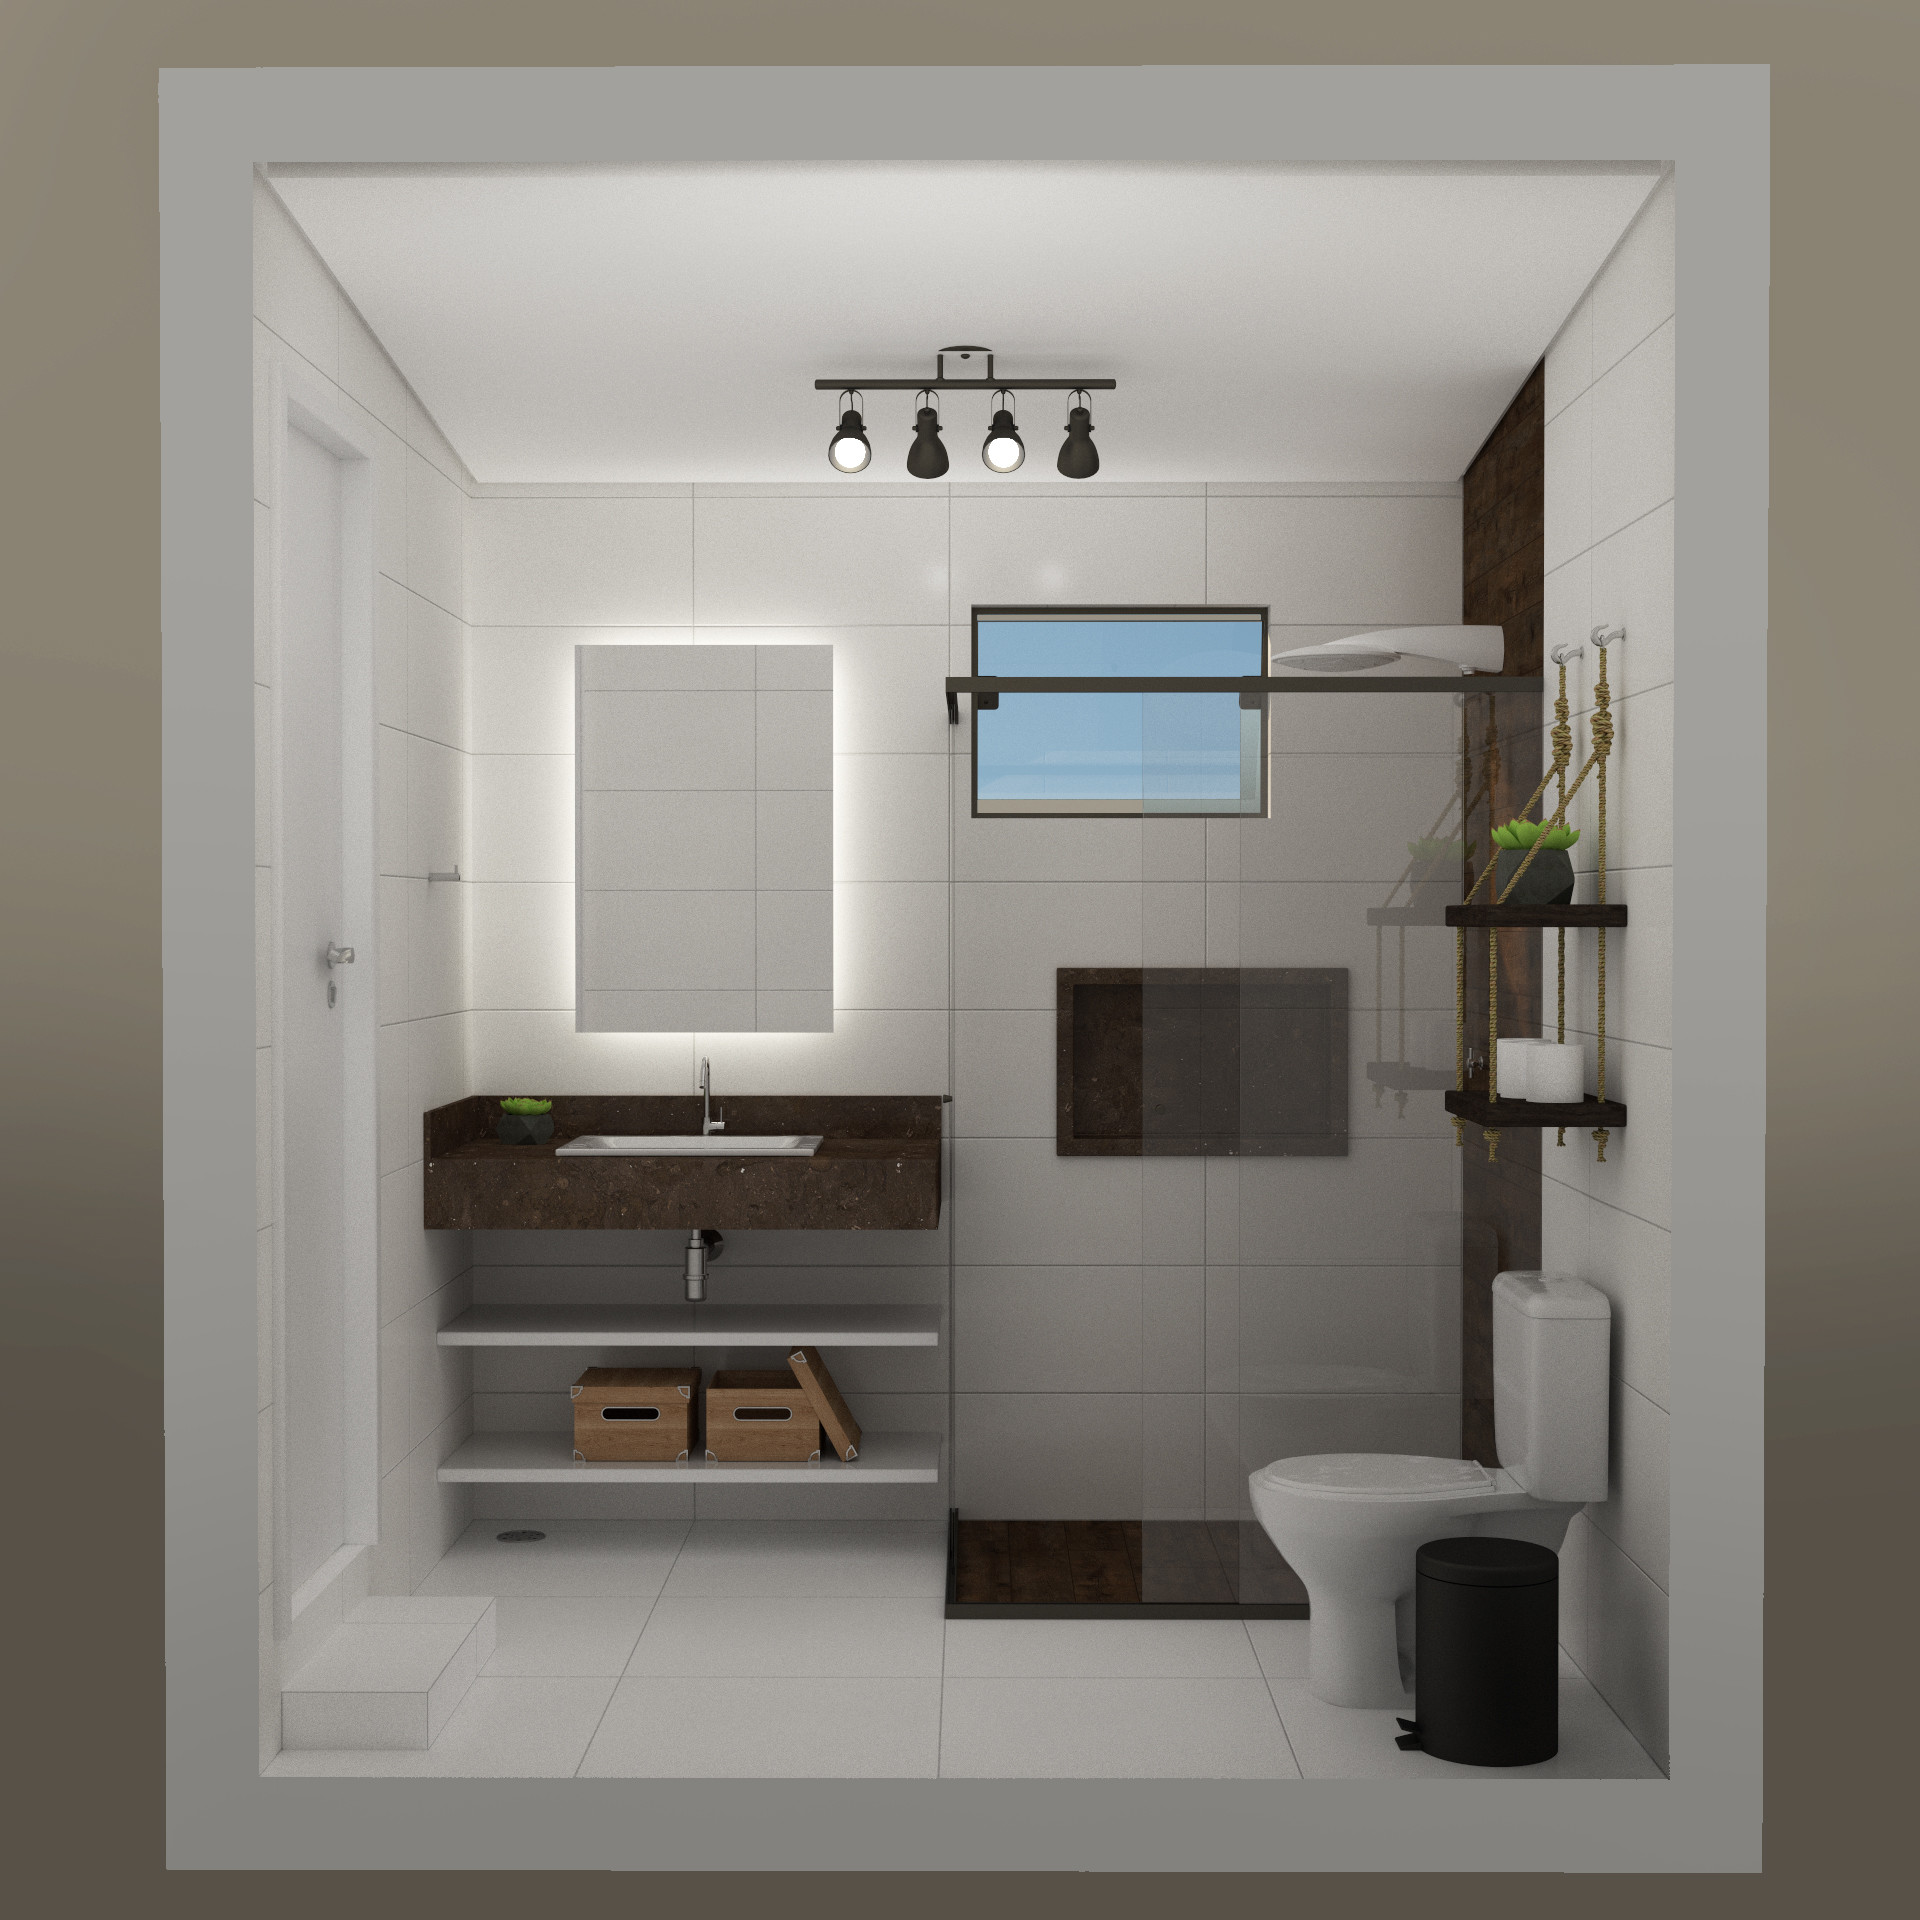 ArtStation - Bathroom design & render, Natalia Brasil